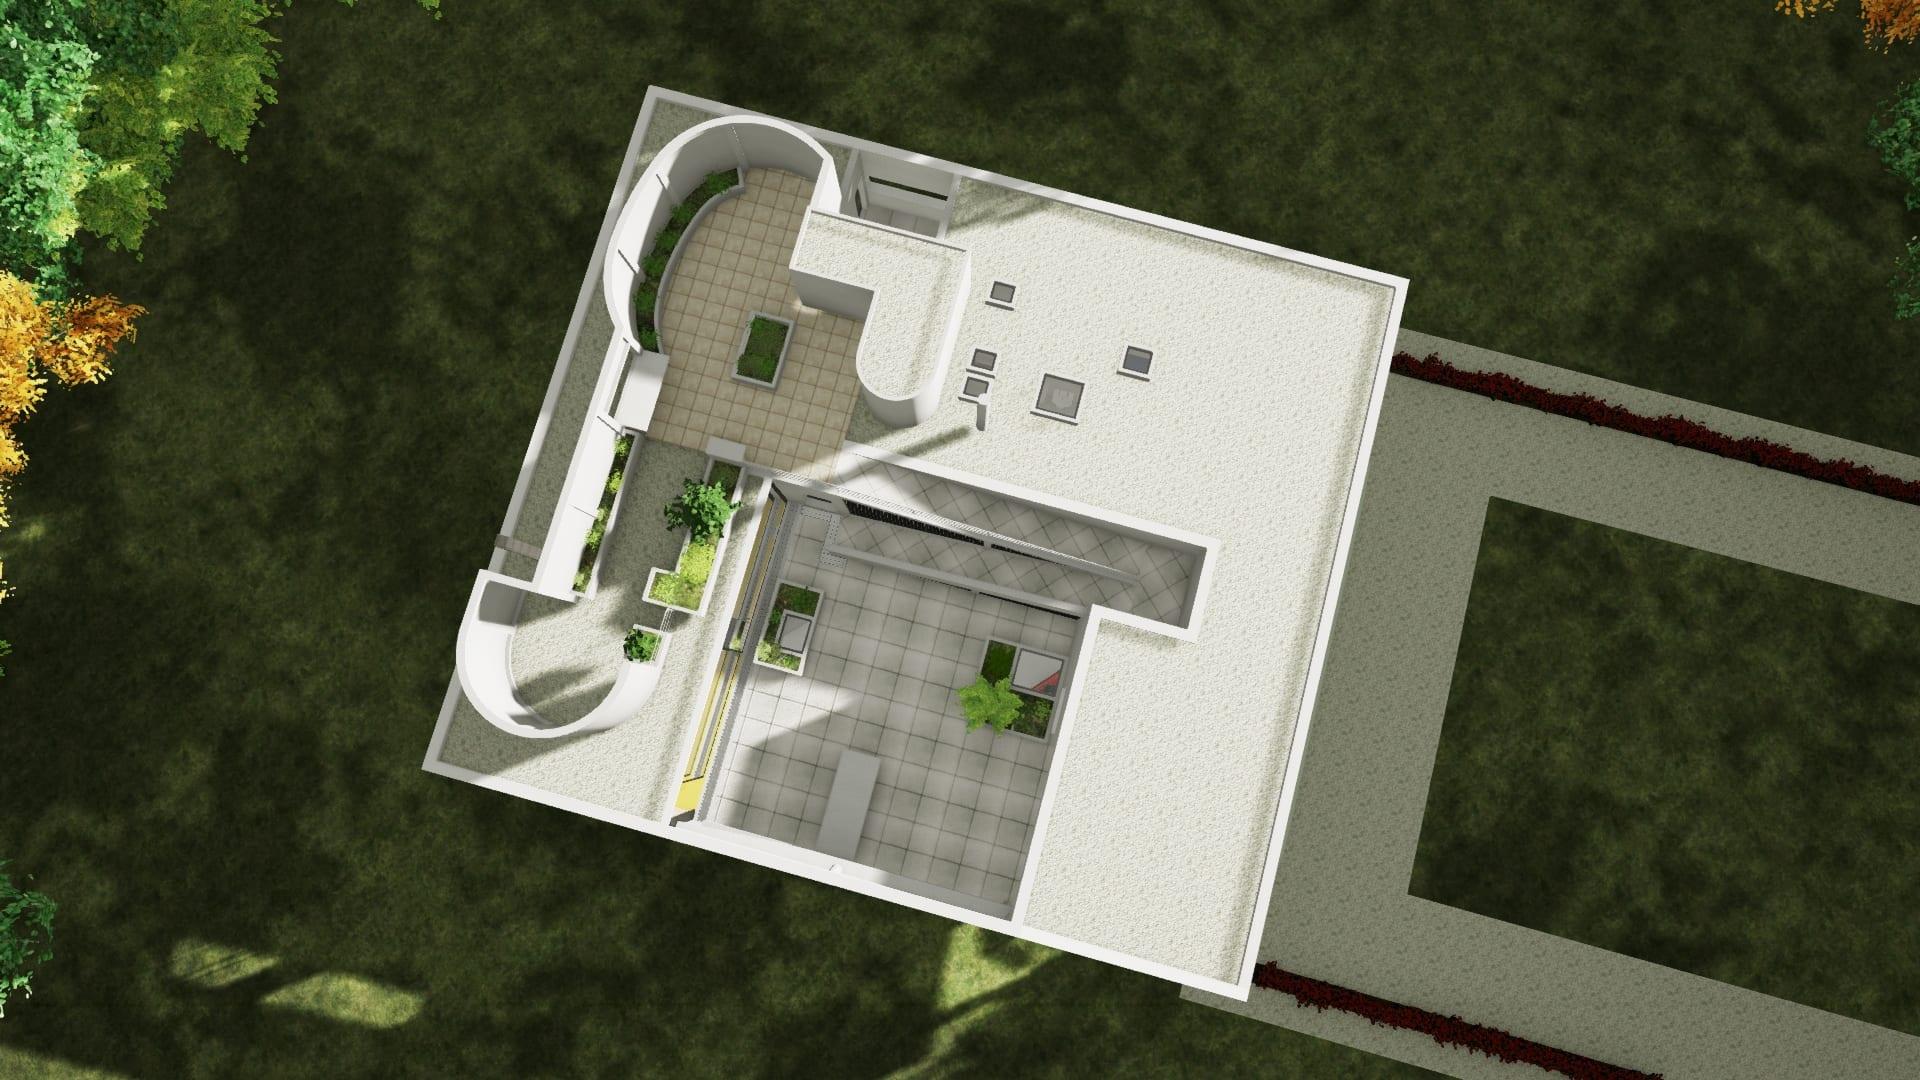 Tetto giardino Villa Savoye